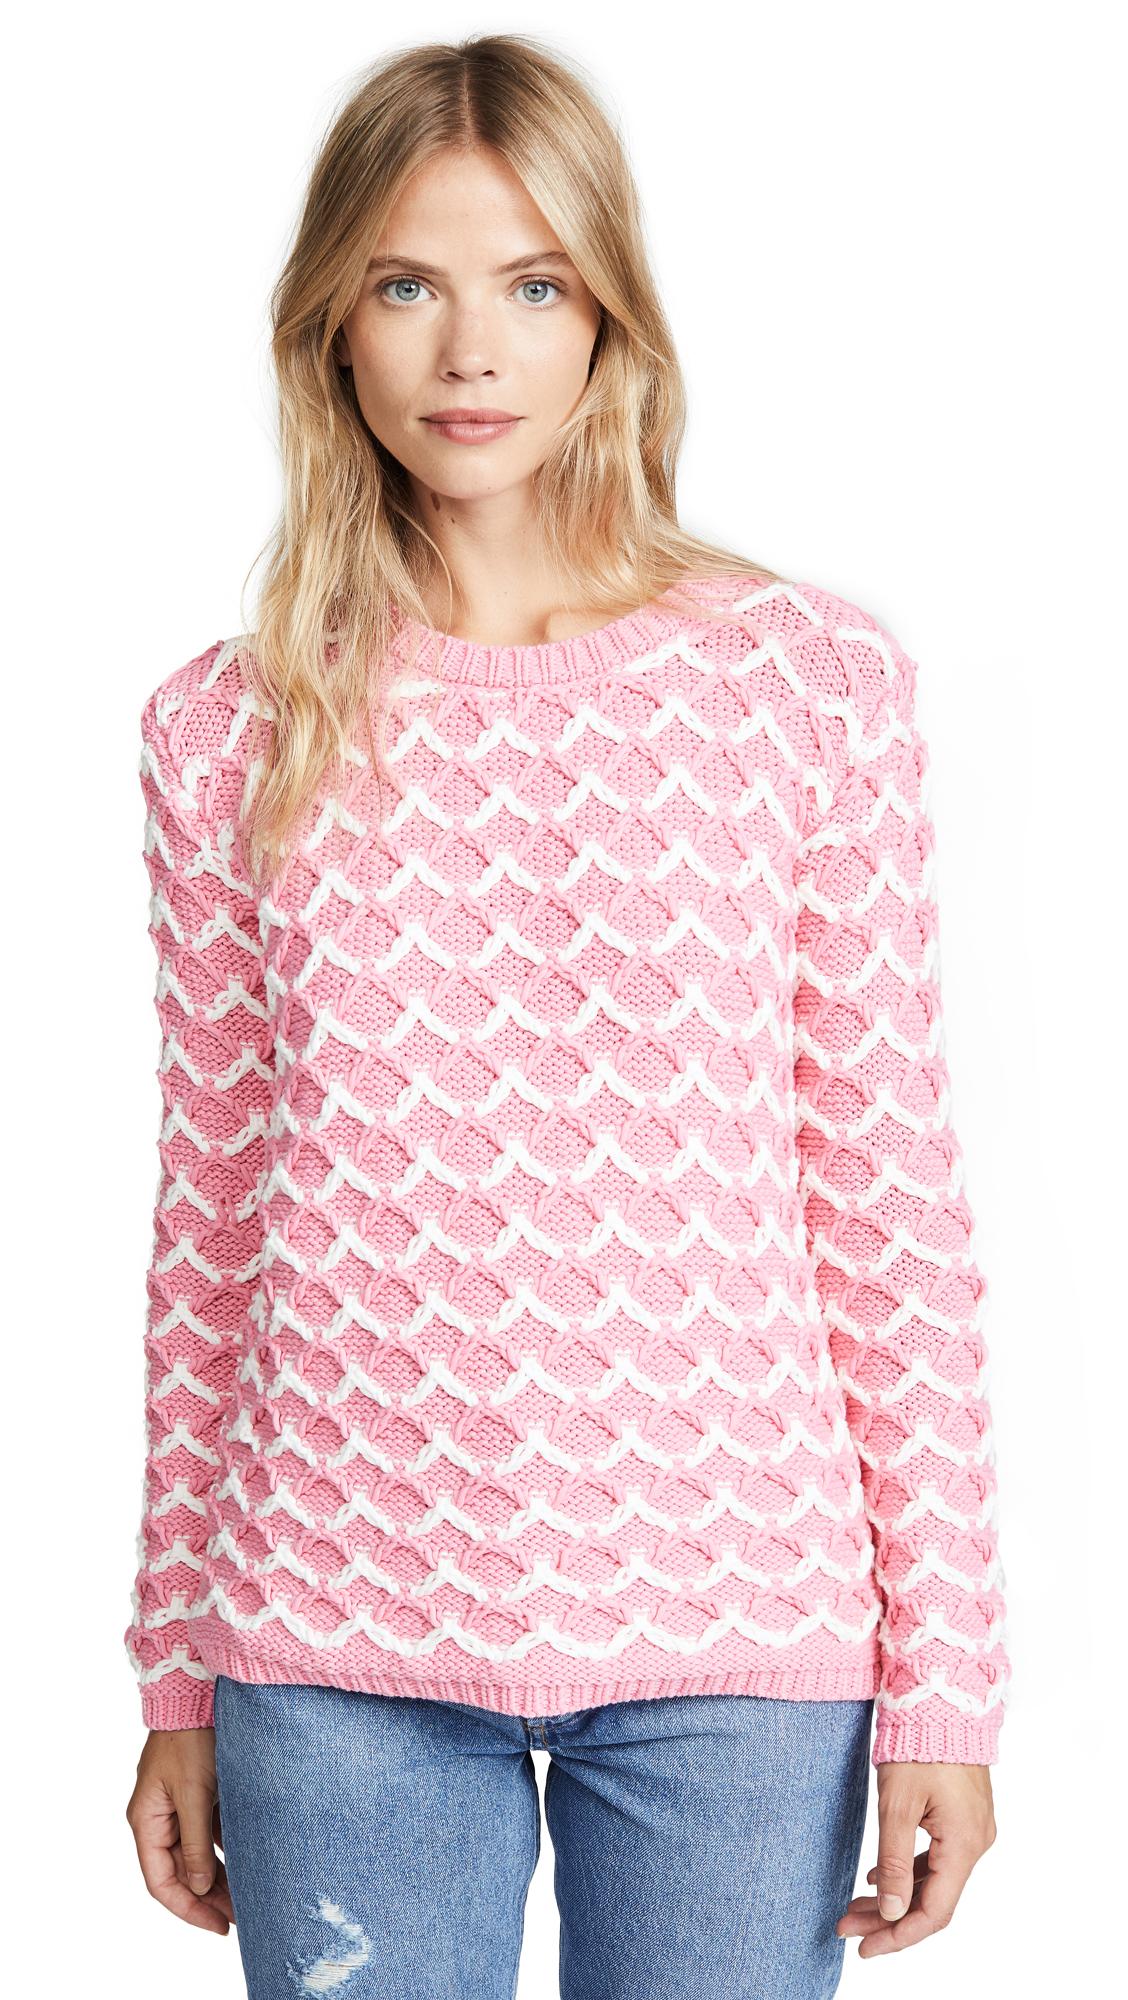 Paul & Joe Sister Bambin Sweater In Pink